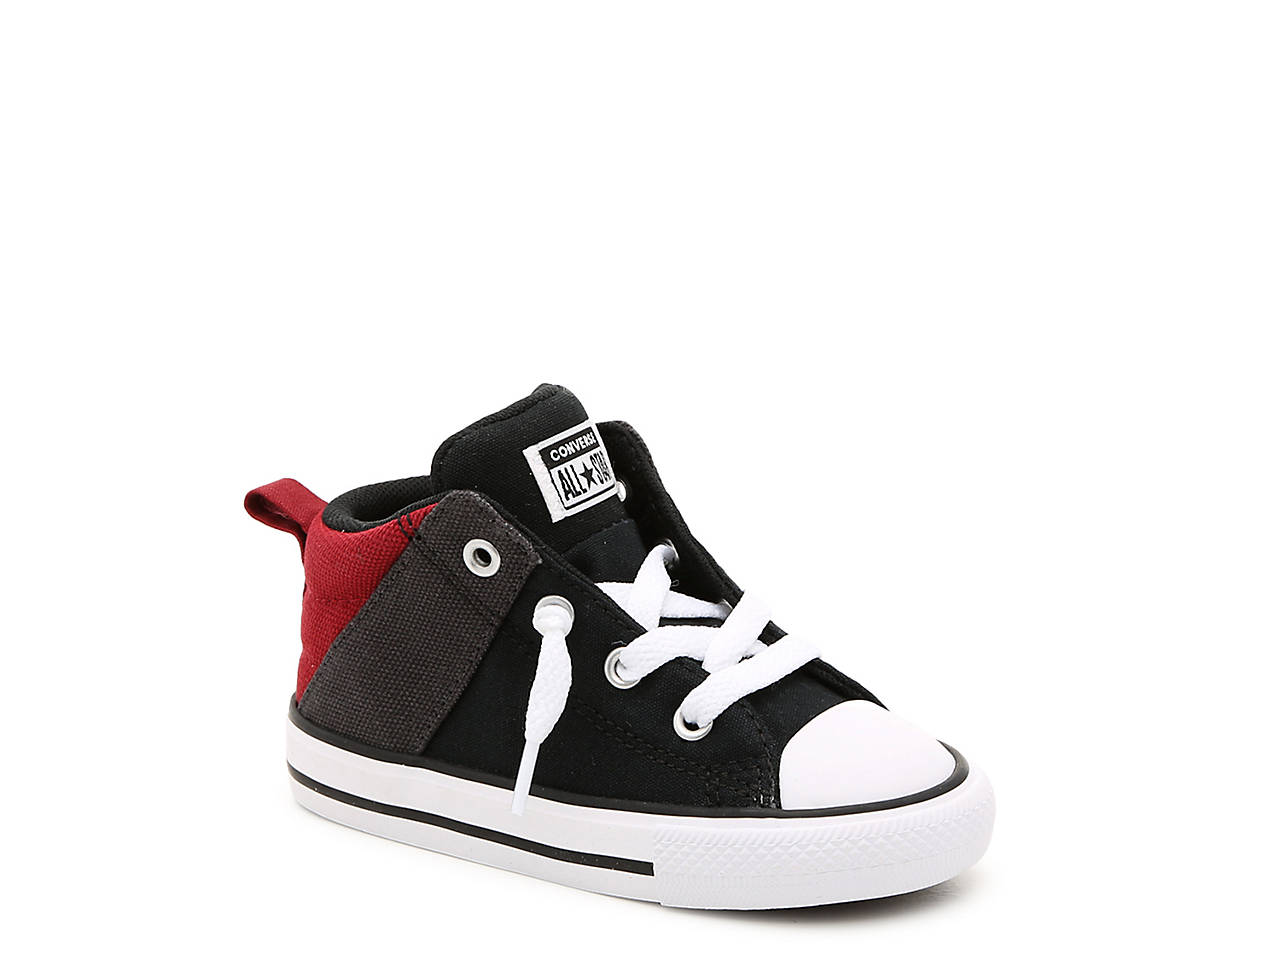 Chuck Taylor All Star Axel Infant & Toddler Slip On Sneaker